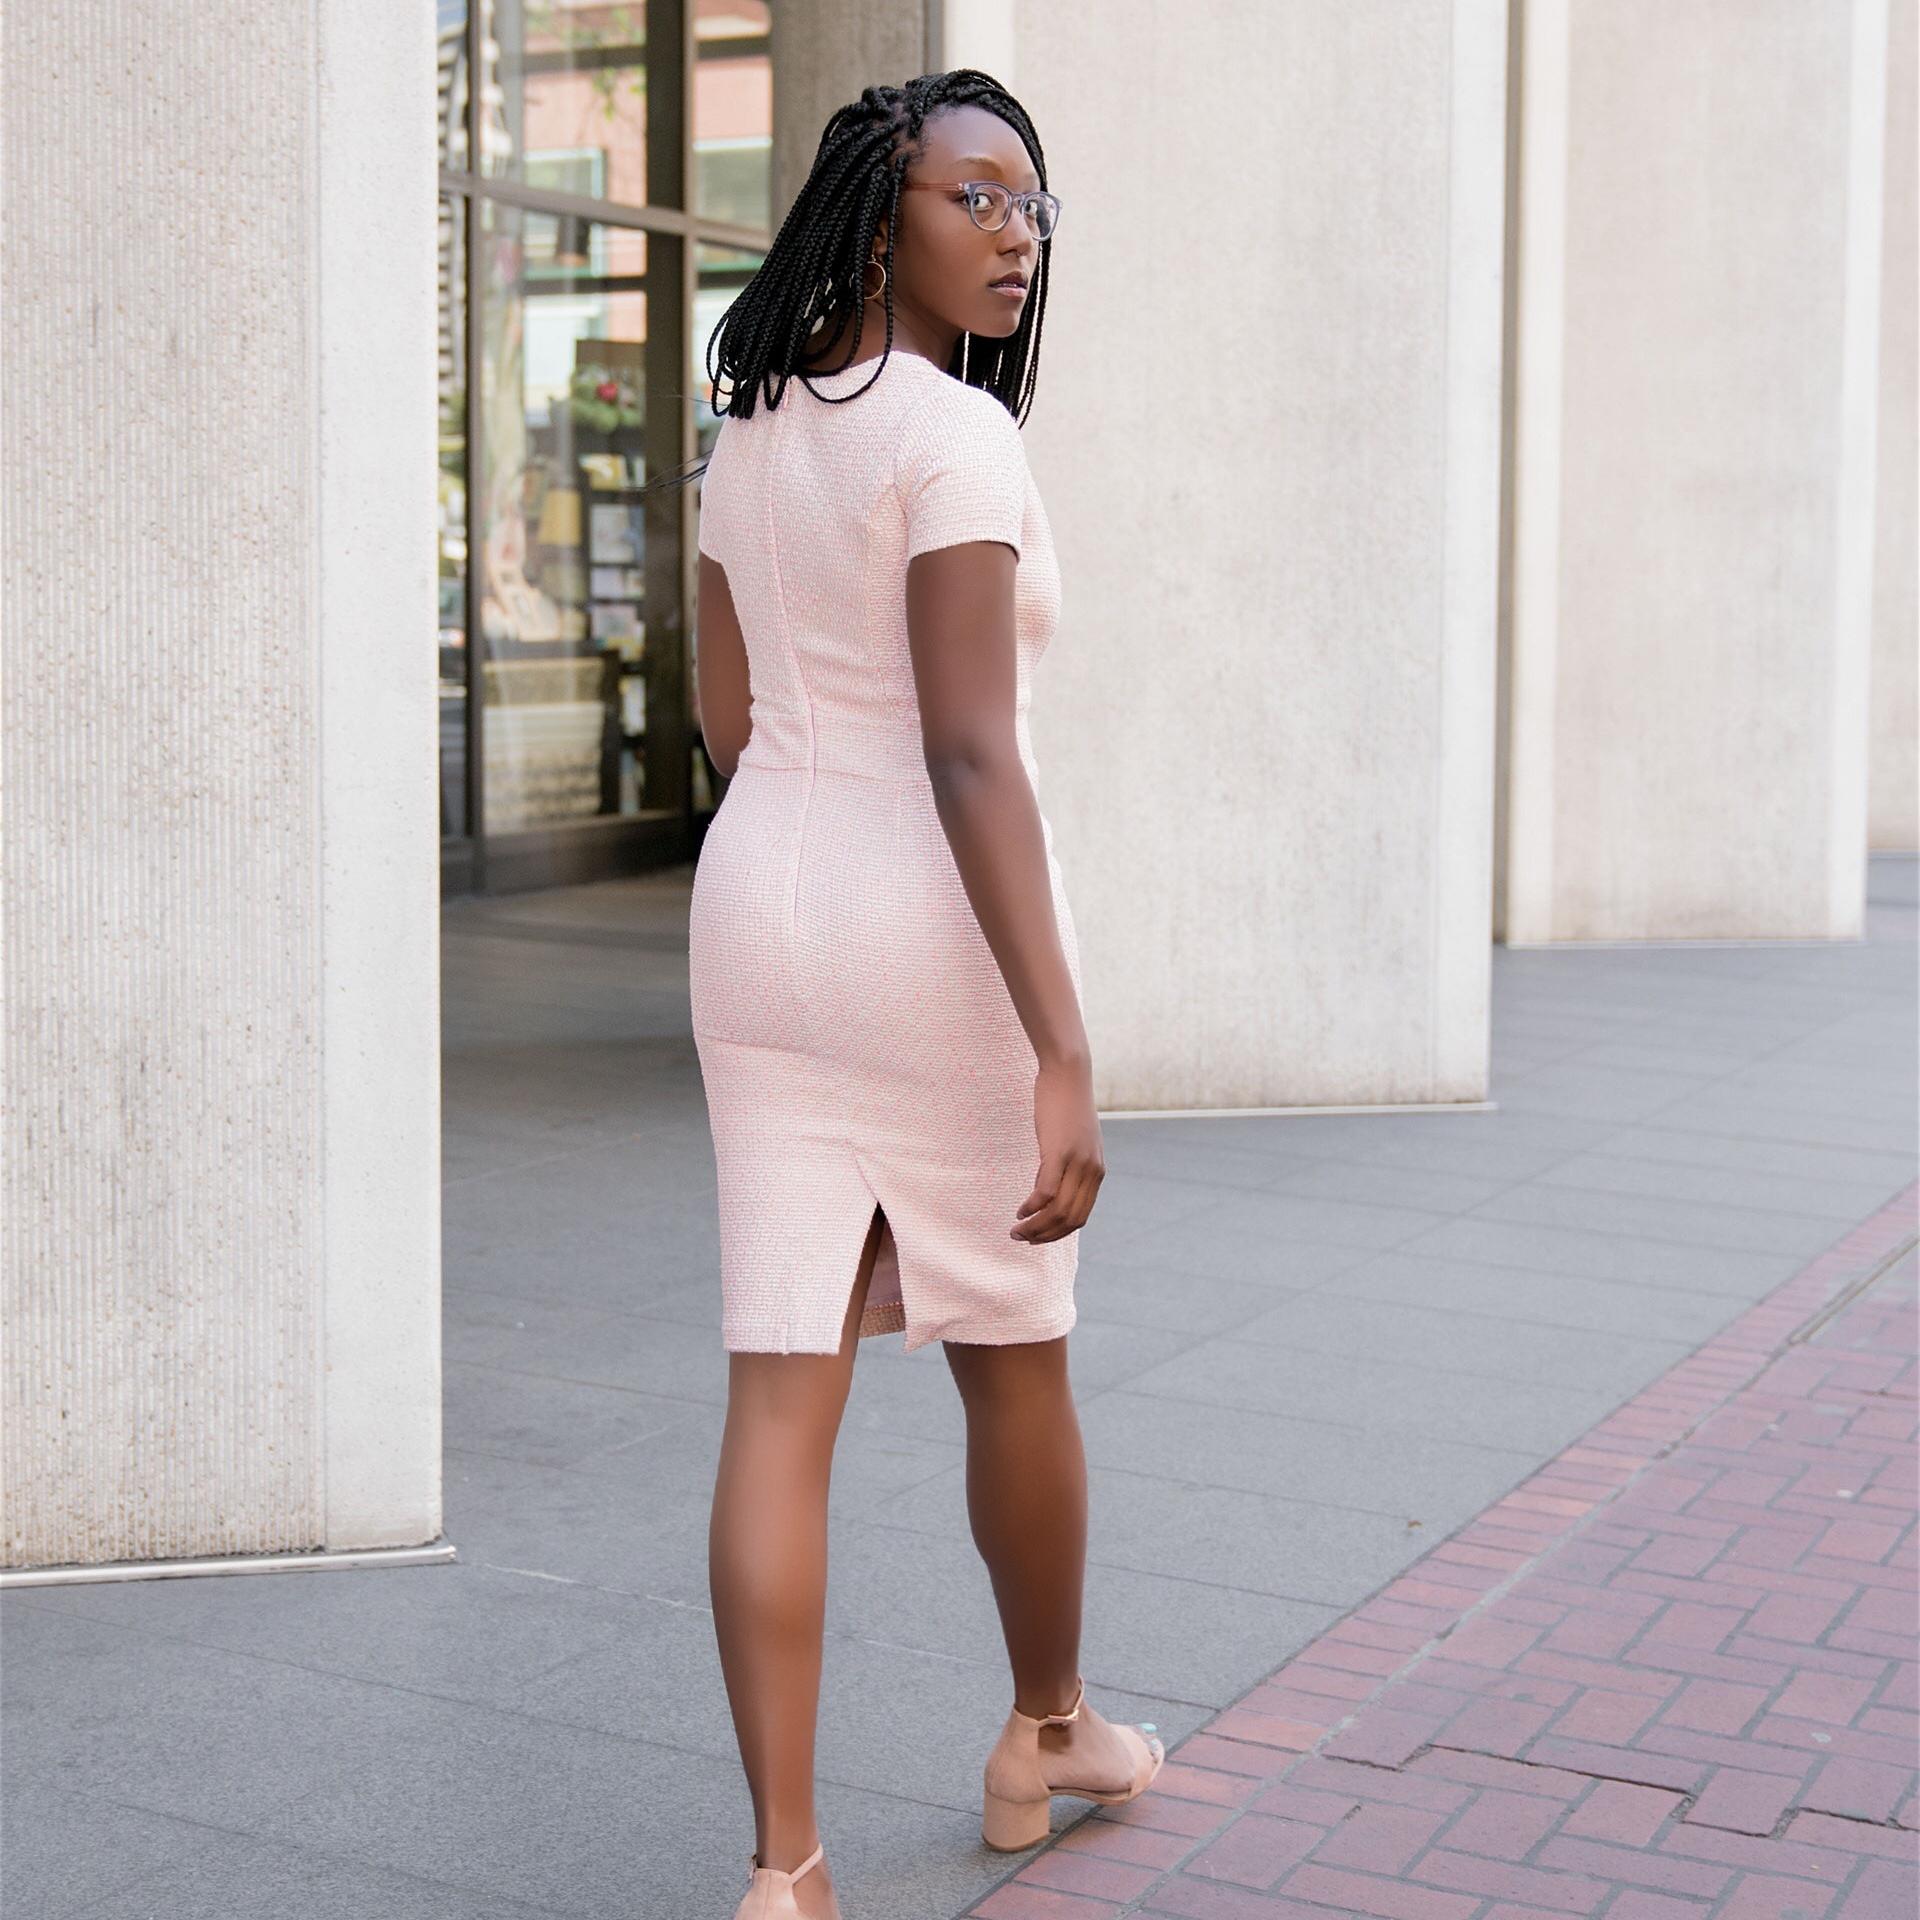 Pink Tweed dress for work